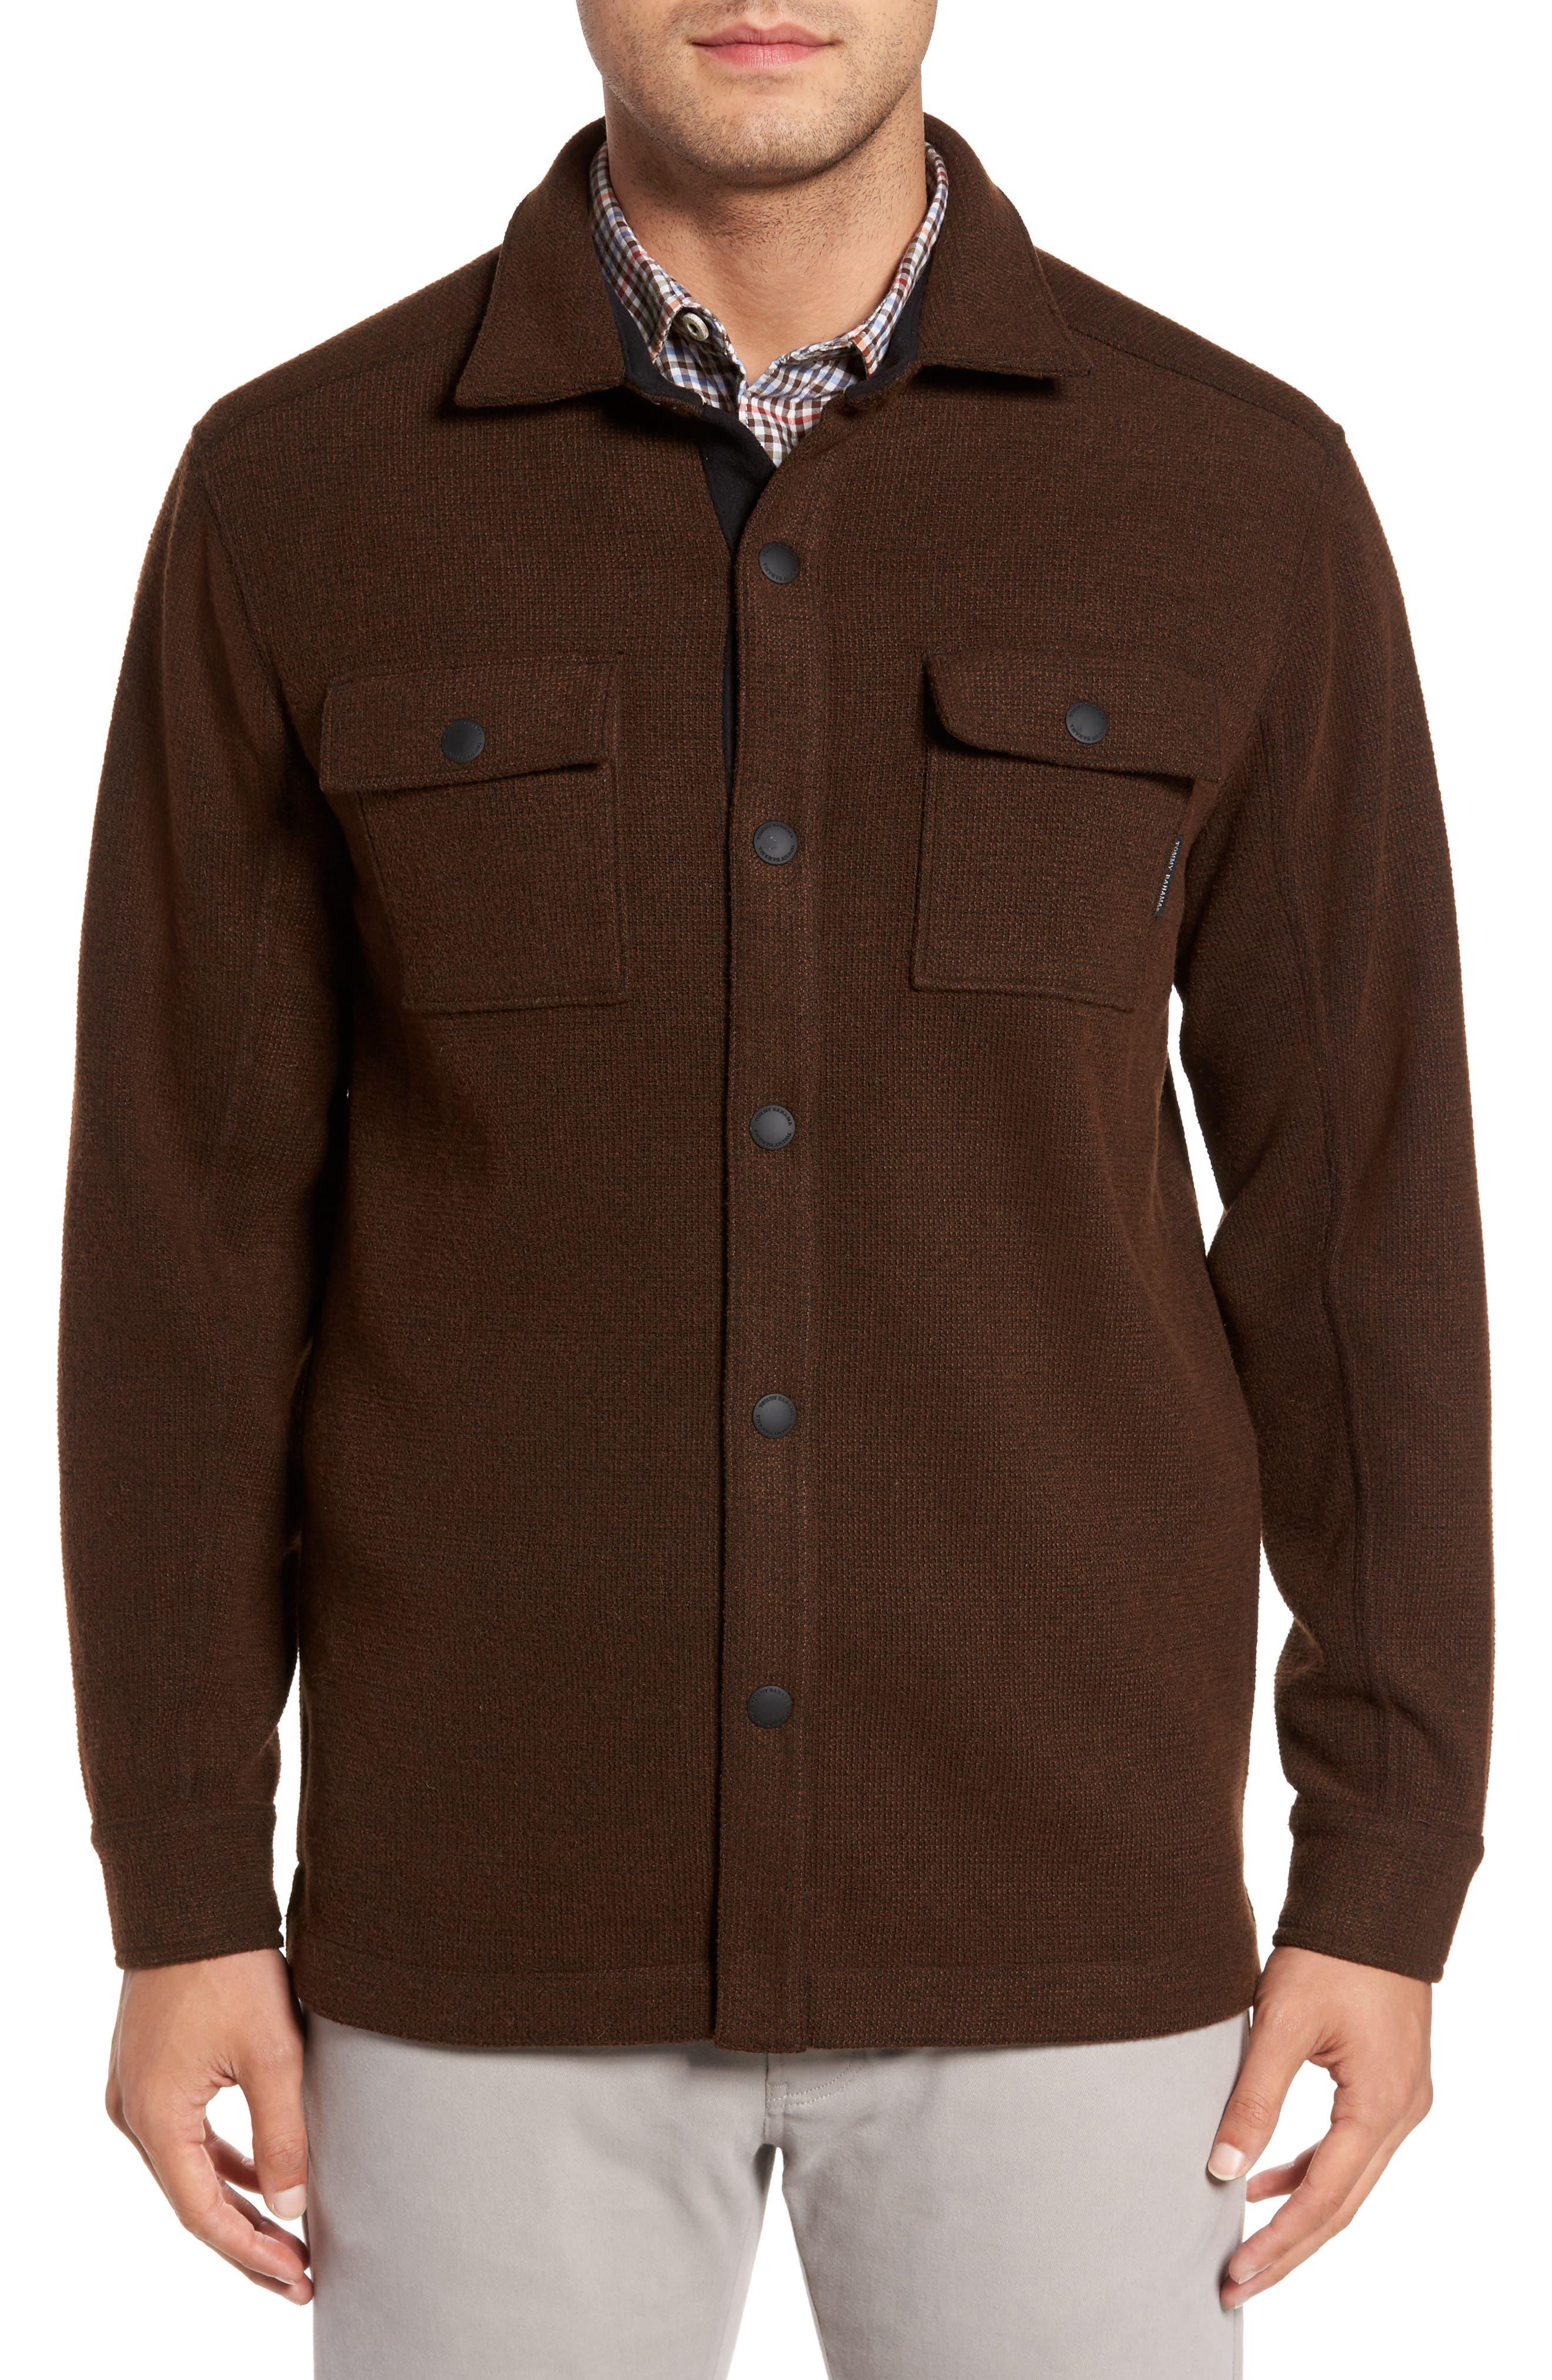 Tommy Bahama Paradise Creek Snap Front Fleece Jacket